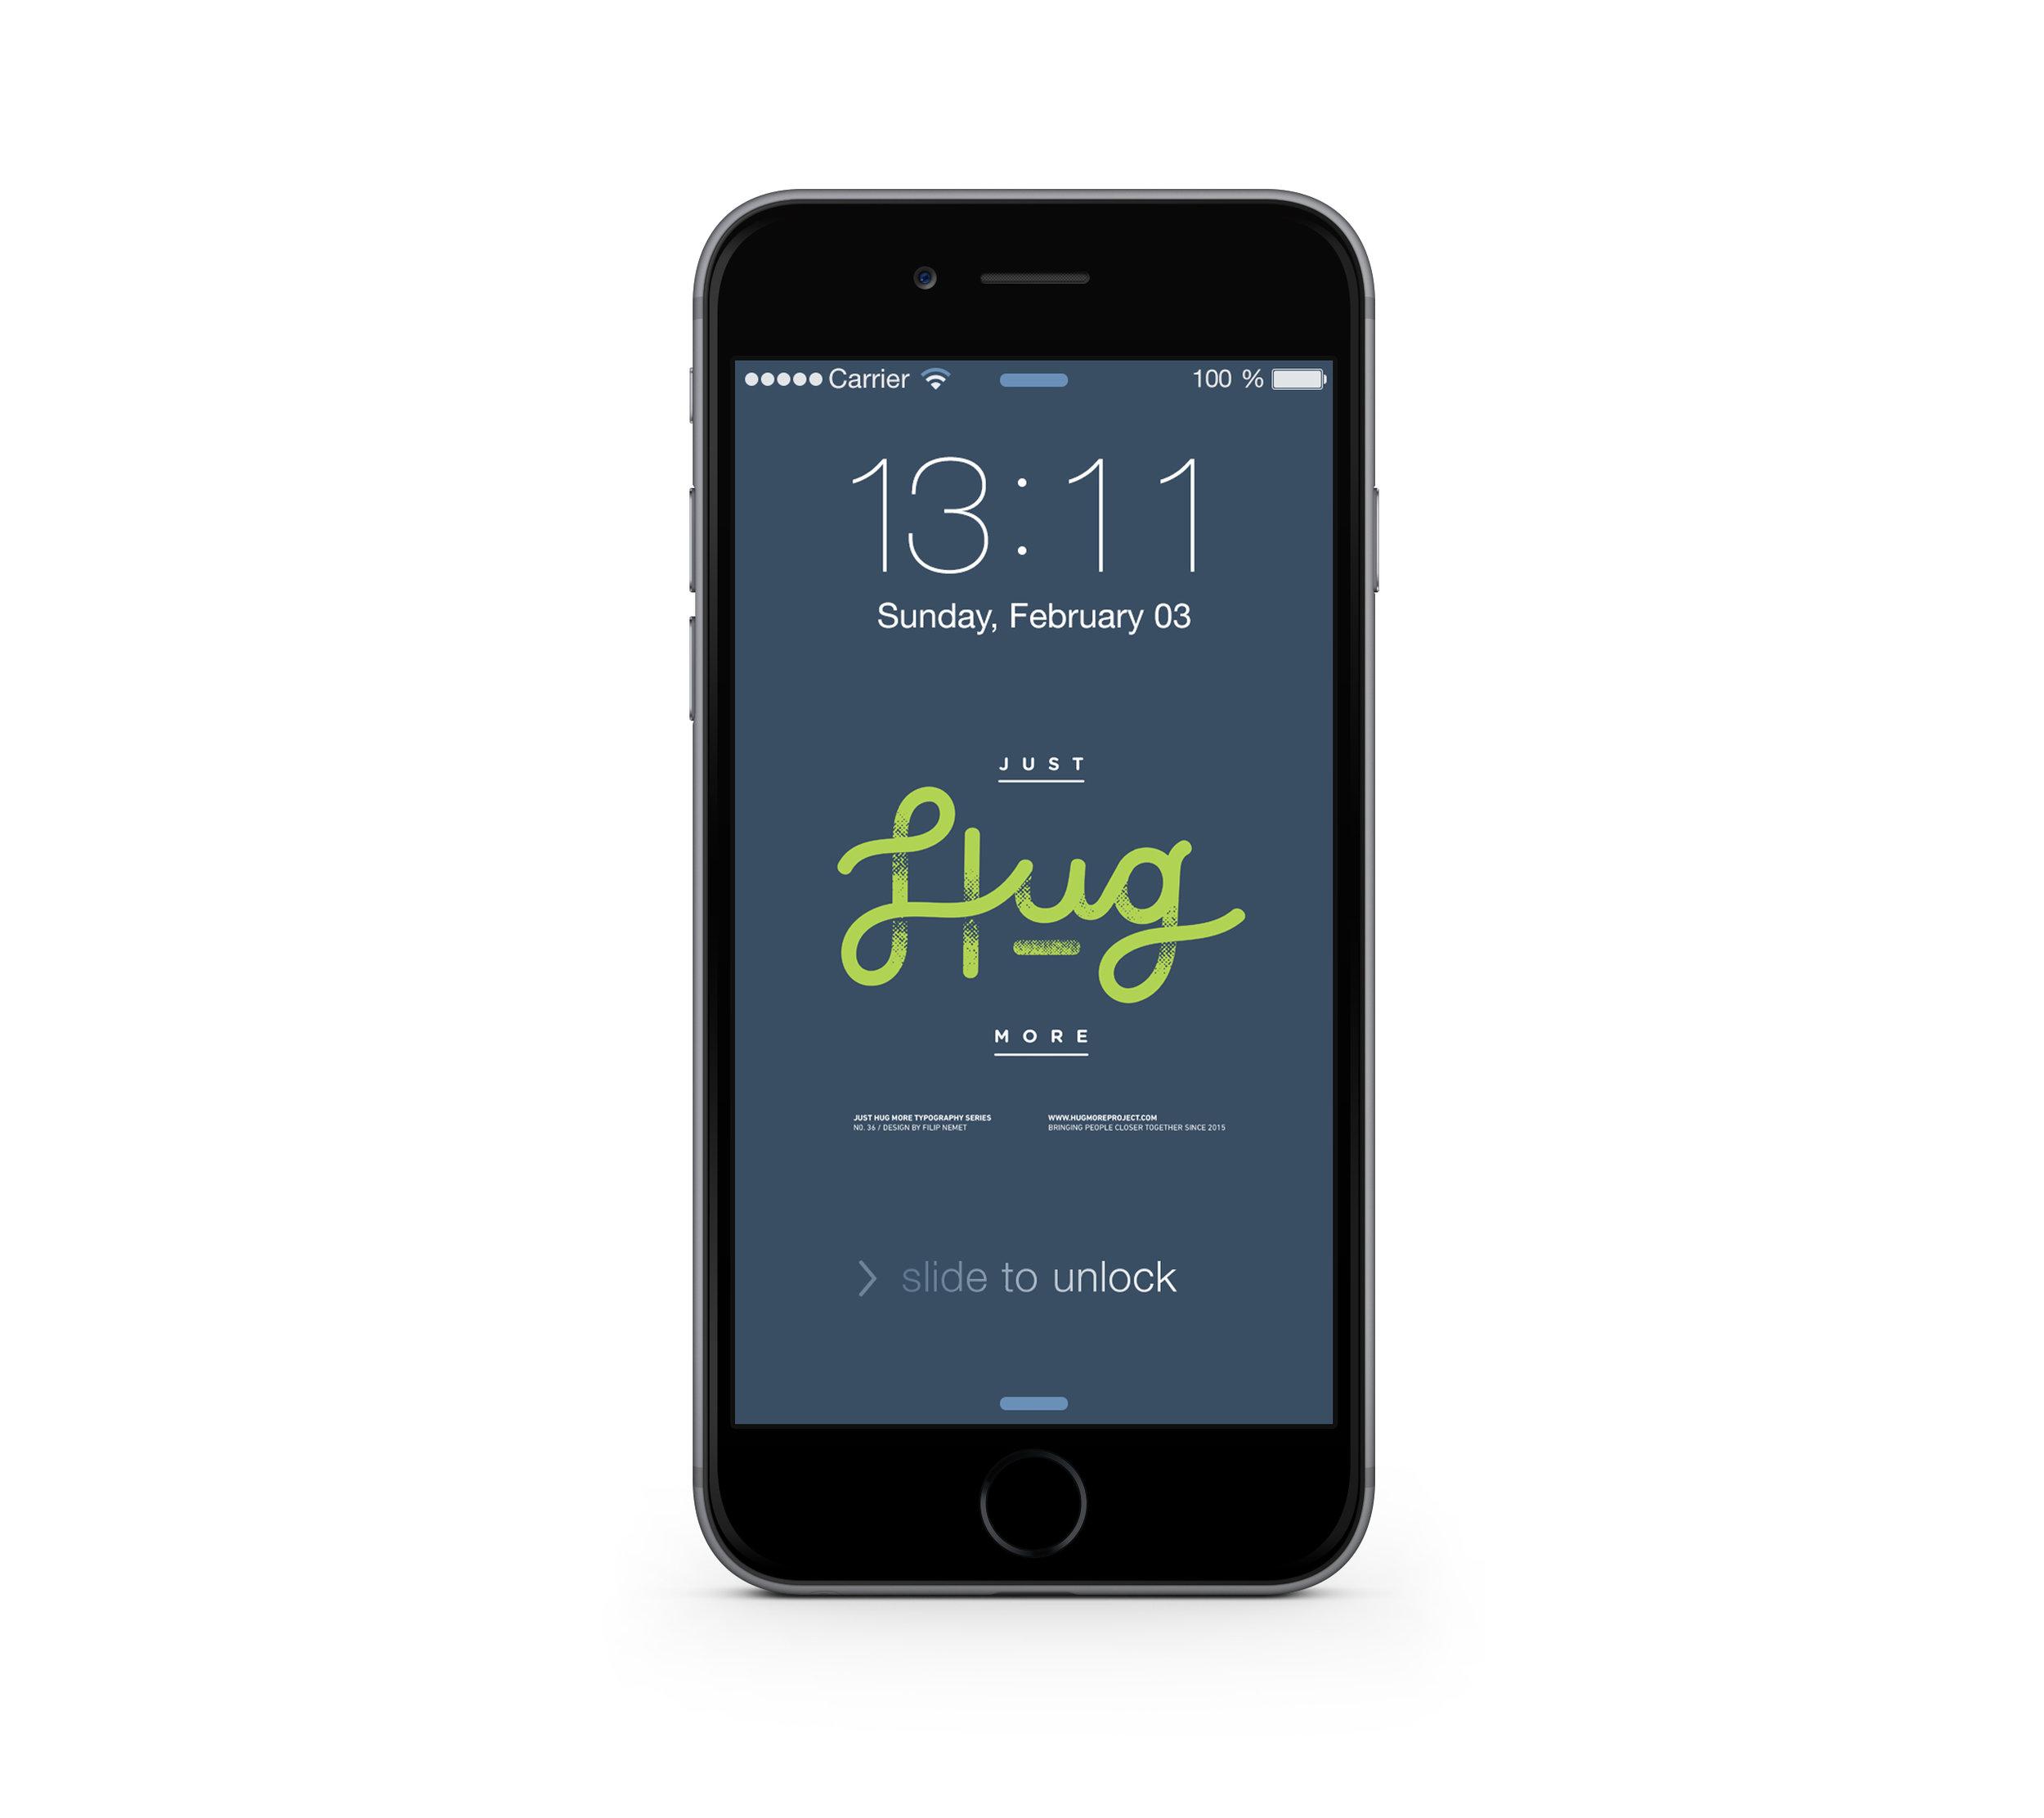 just-hug-more-typo-036-iPhone-mockup-onwhite.jpg